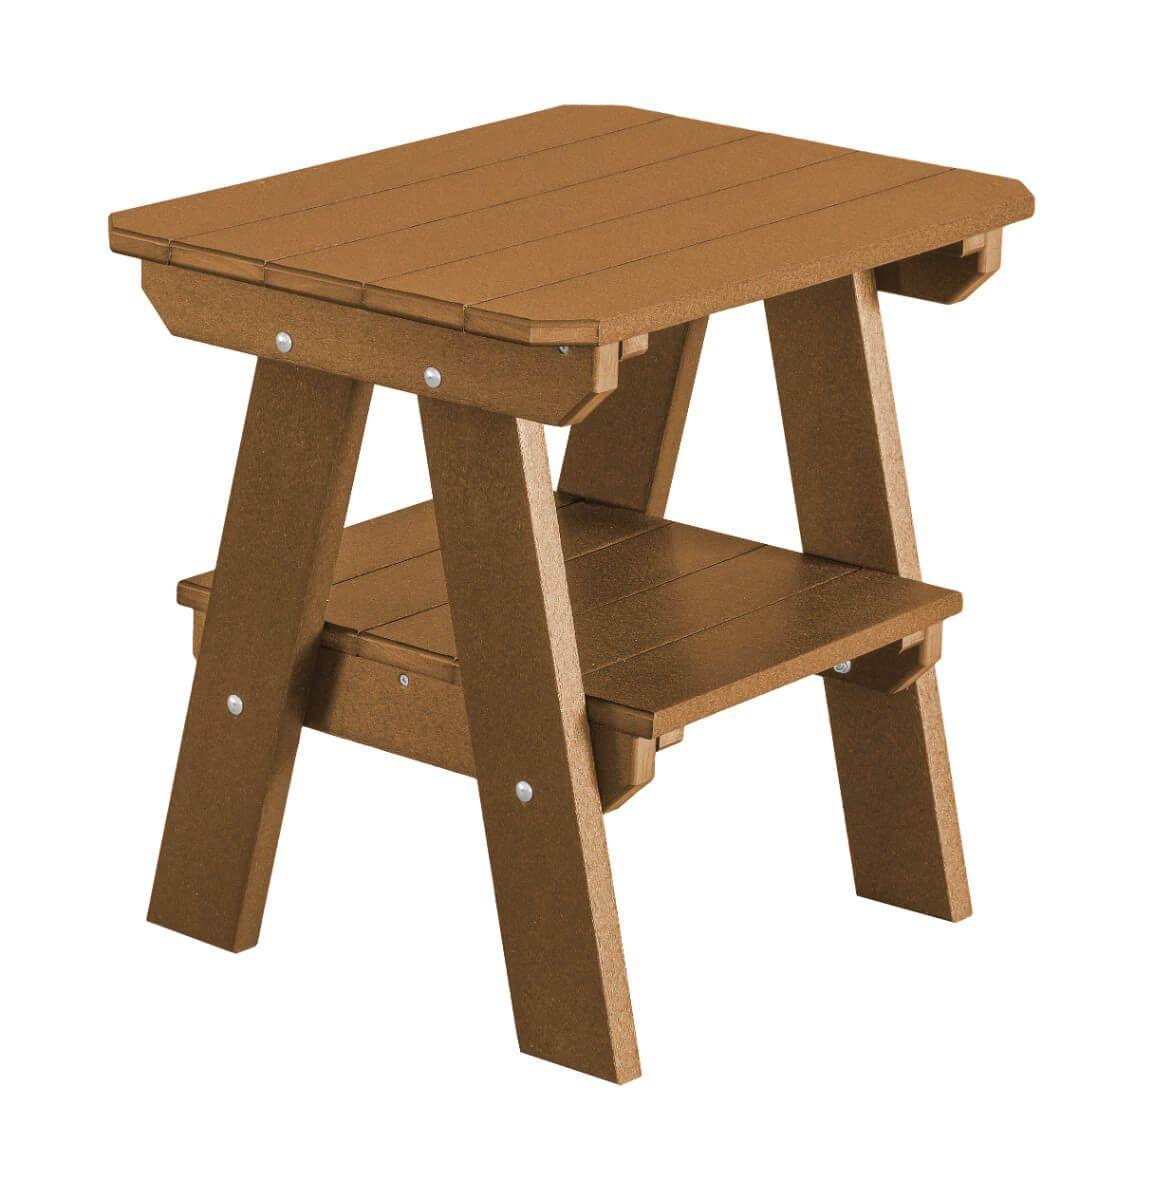 Tudor Brown Sidra Outdoor End Table